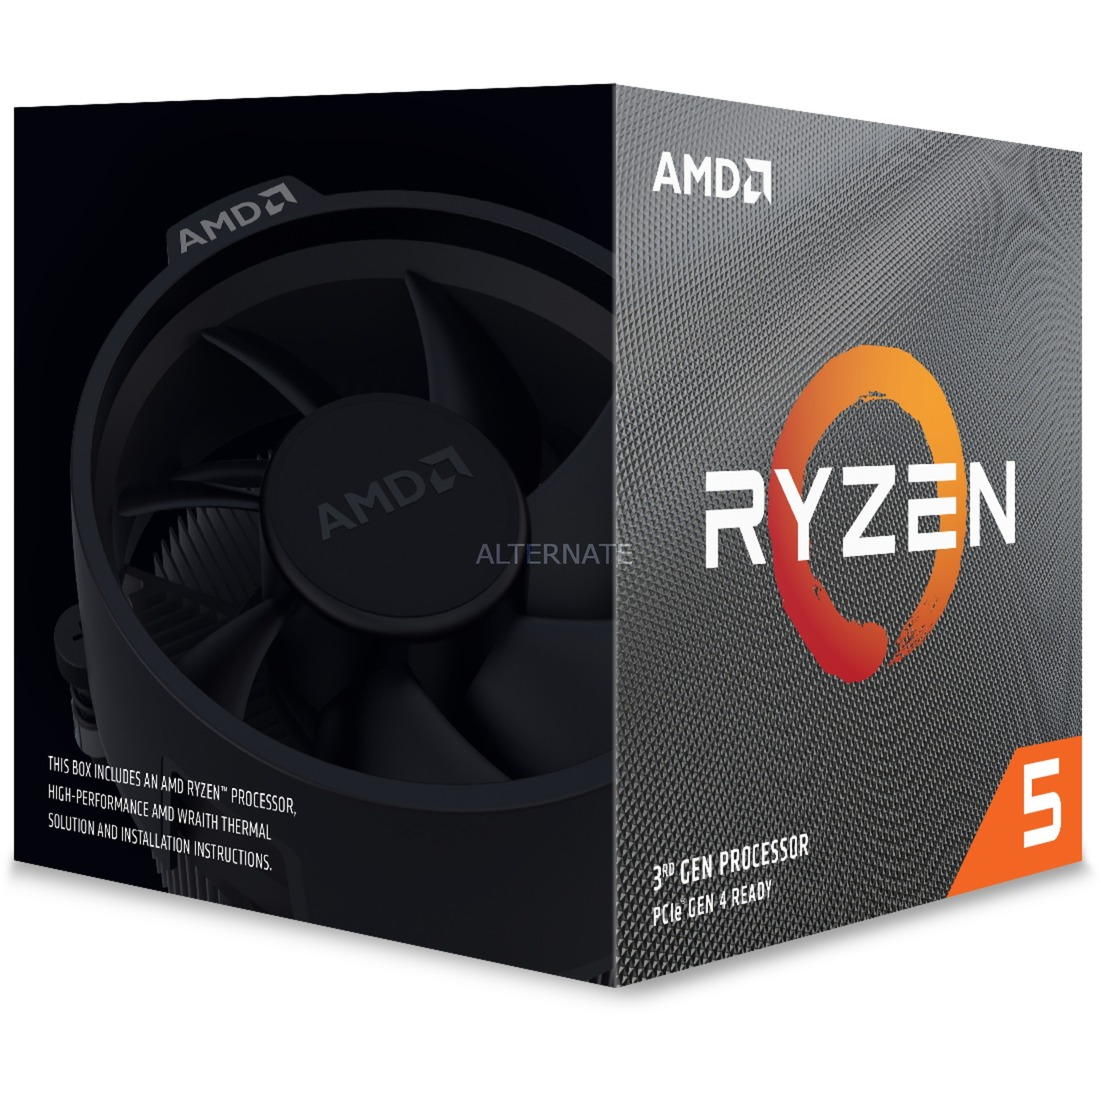 Ryzen 5 3600X procesador 3,8 GHz Caja 32 MB L3